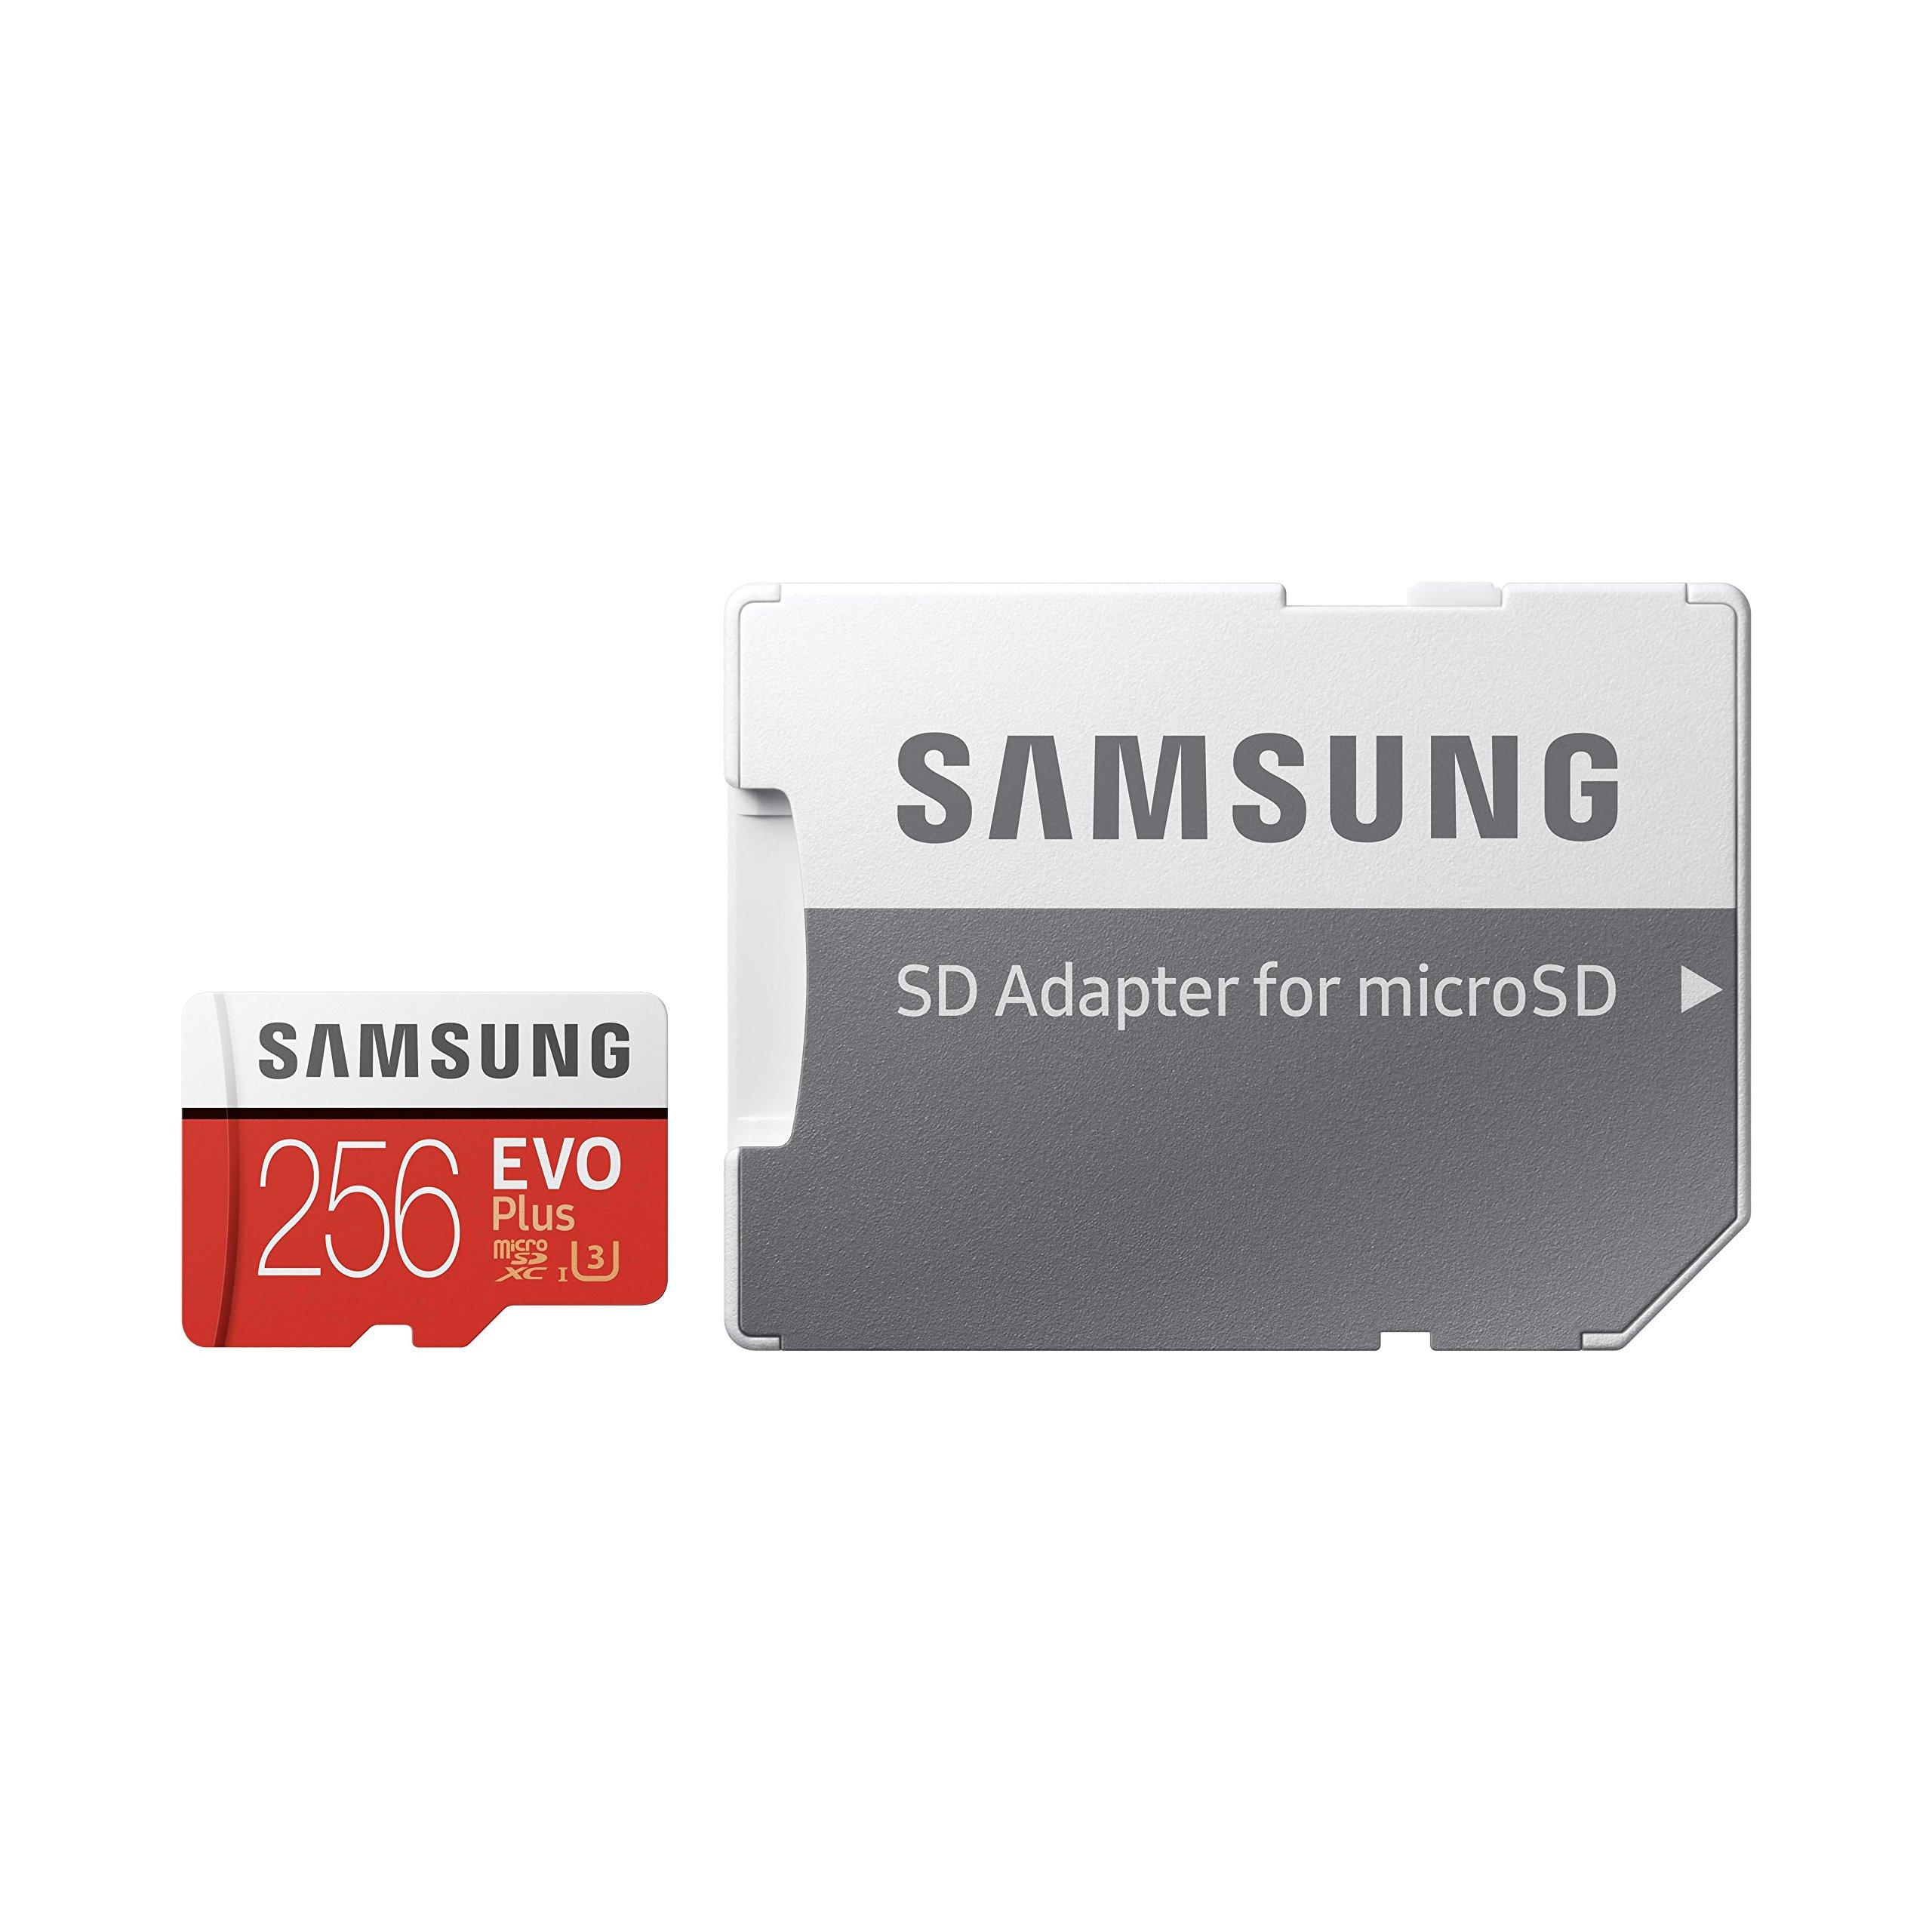 Samsung 256GB EVO Plus Class 10 UHS-I microSDXC U3 with Adapter (MB-MC256GA) by Samsung (Image #8)